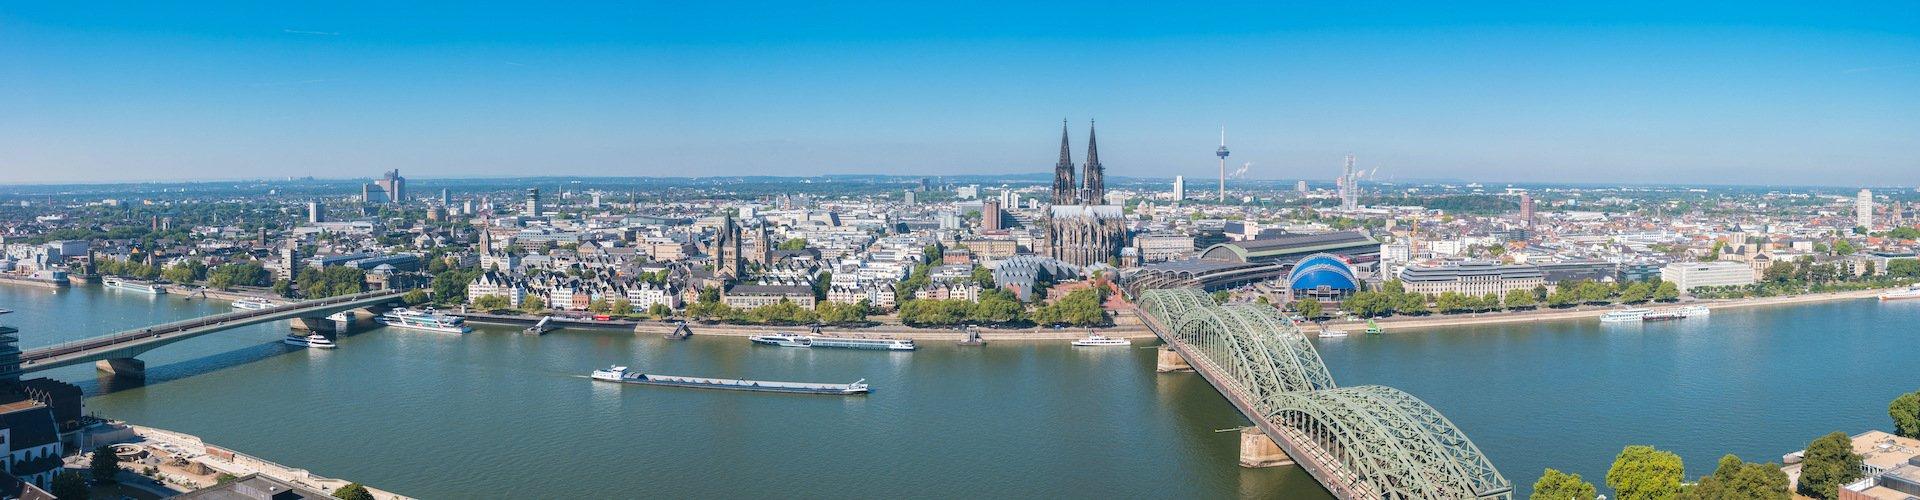 Familienurlaub im Rheinland